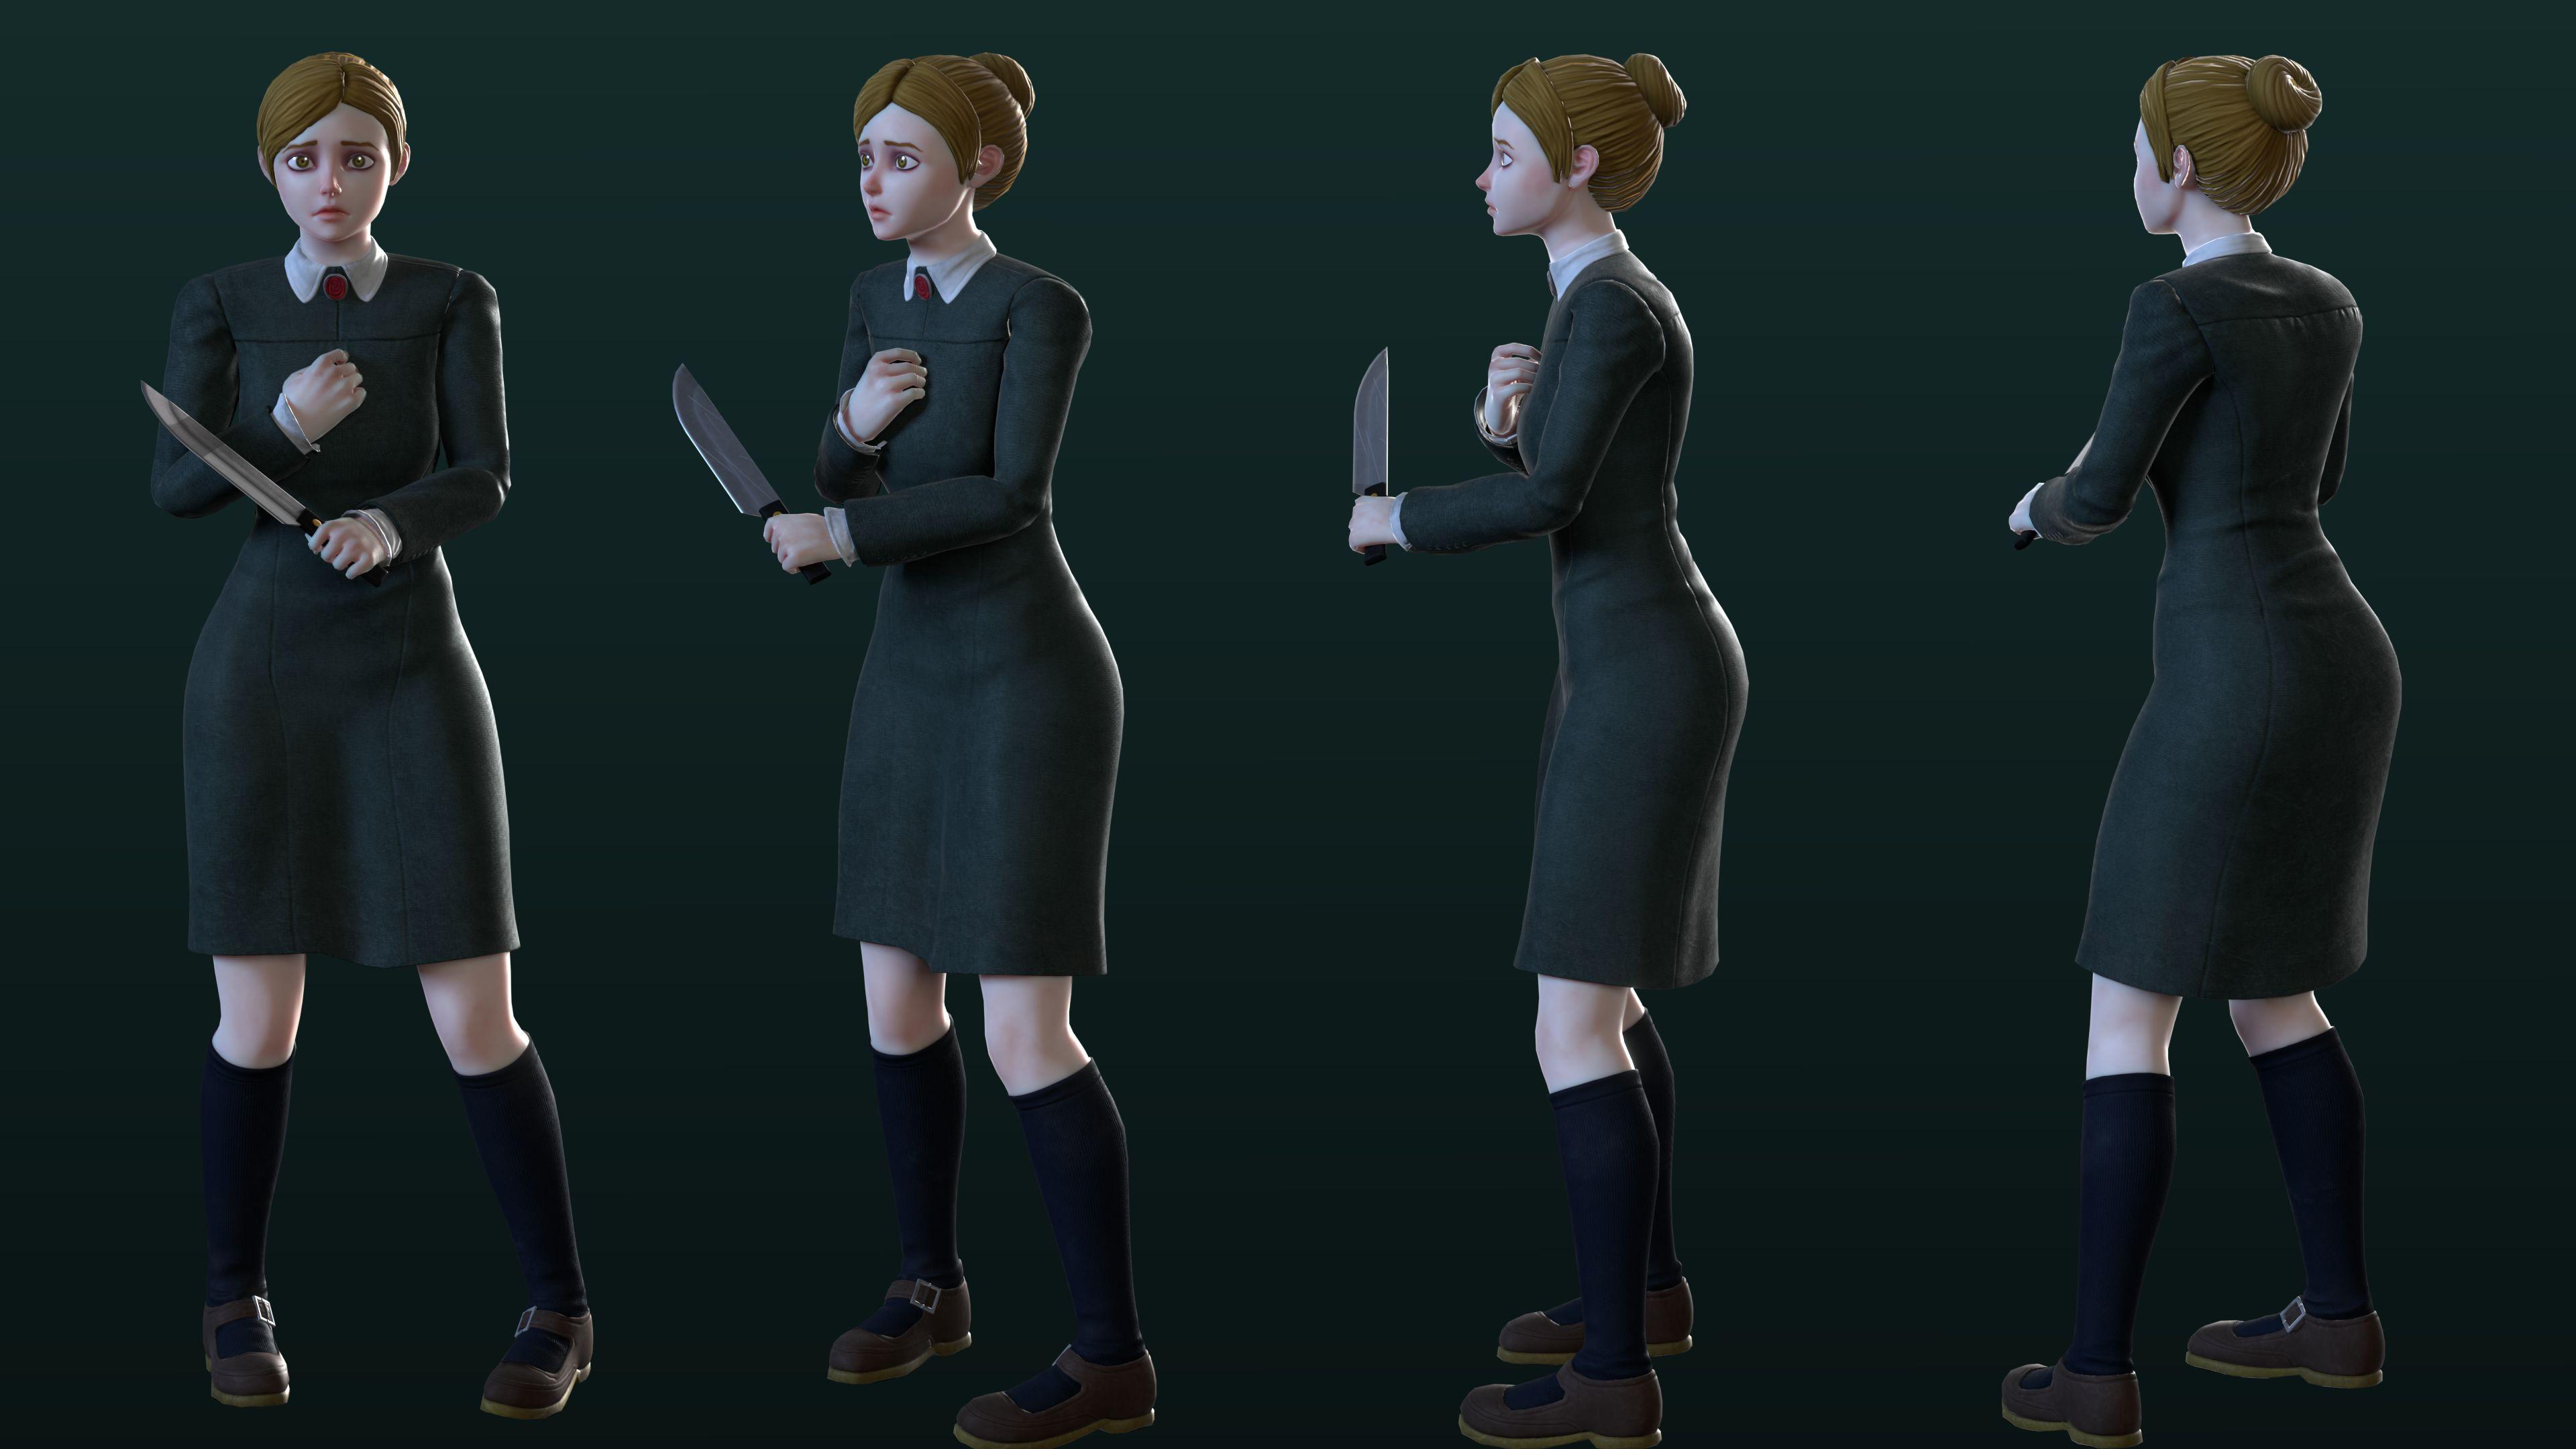 Jennifer low poly character rotation